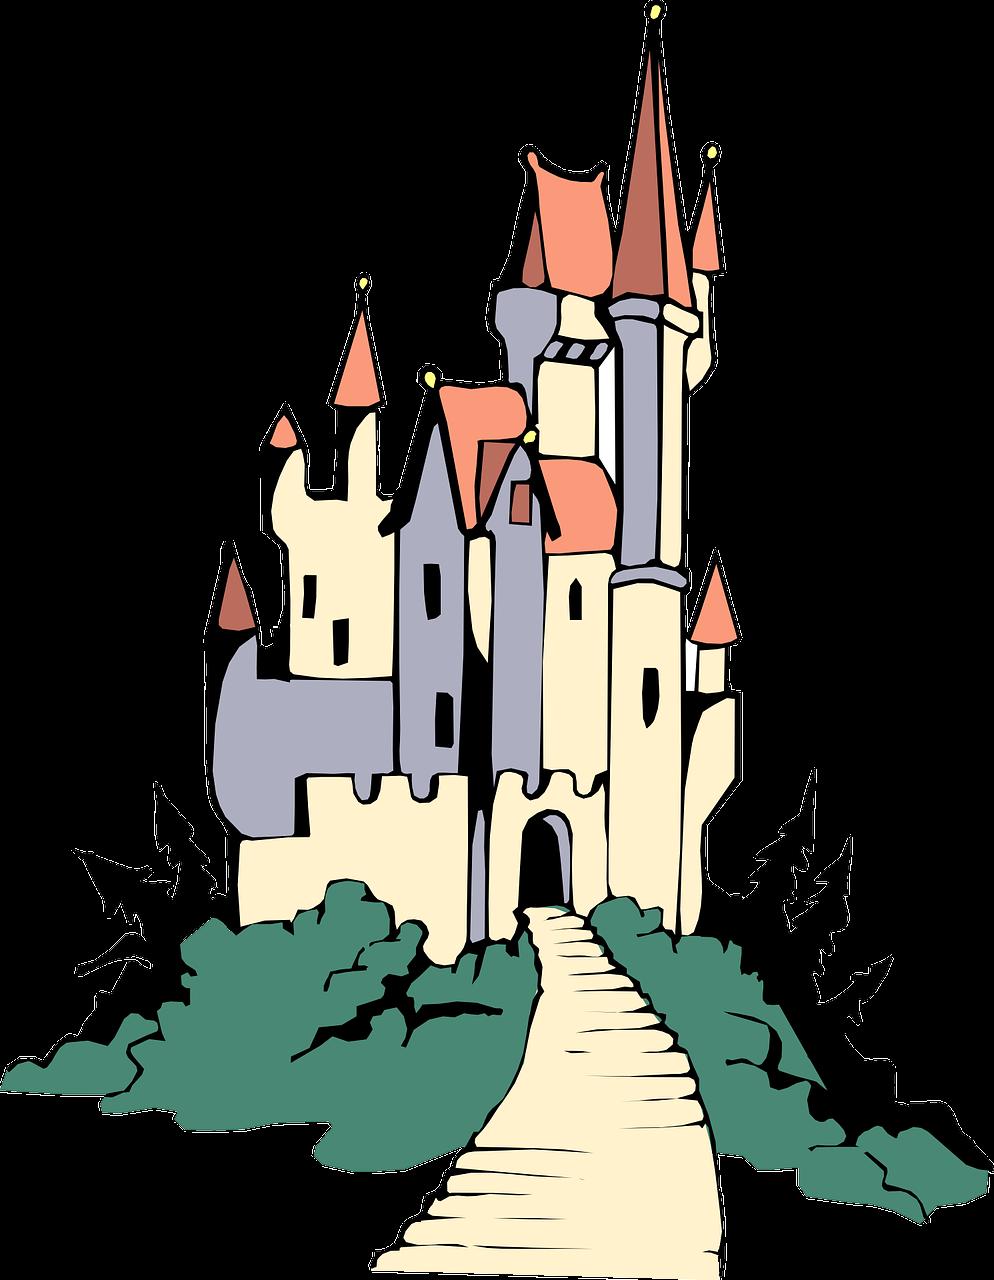 Fairytale clipart king castle. English historical fiction authors